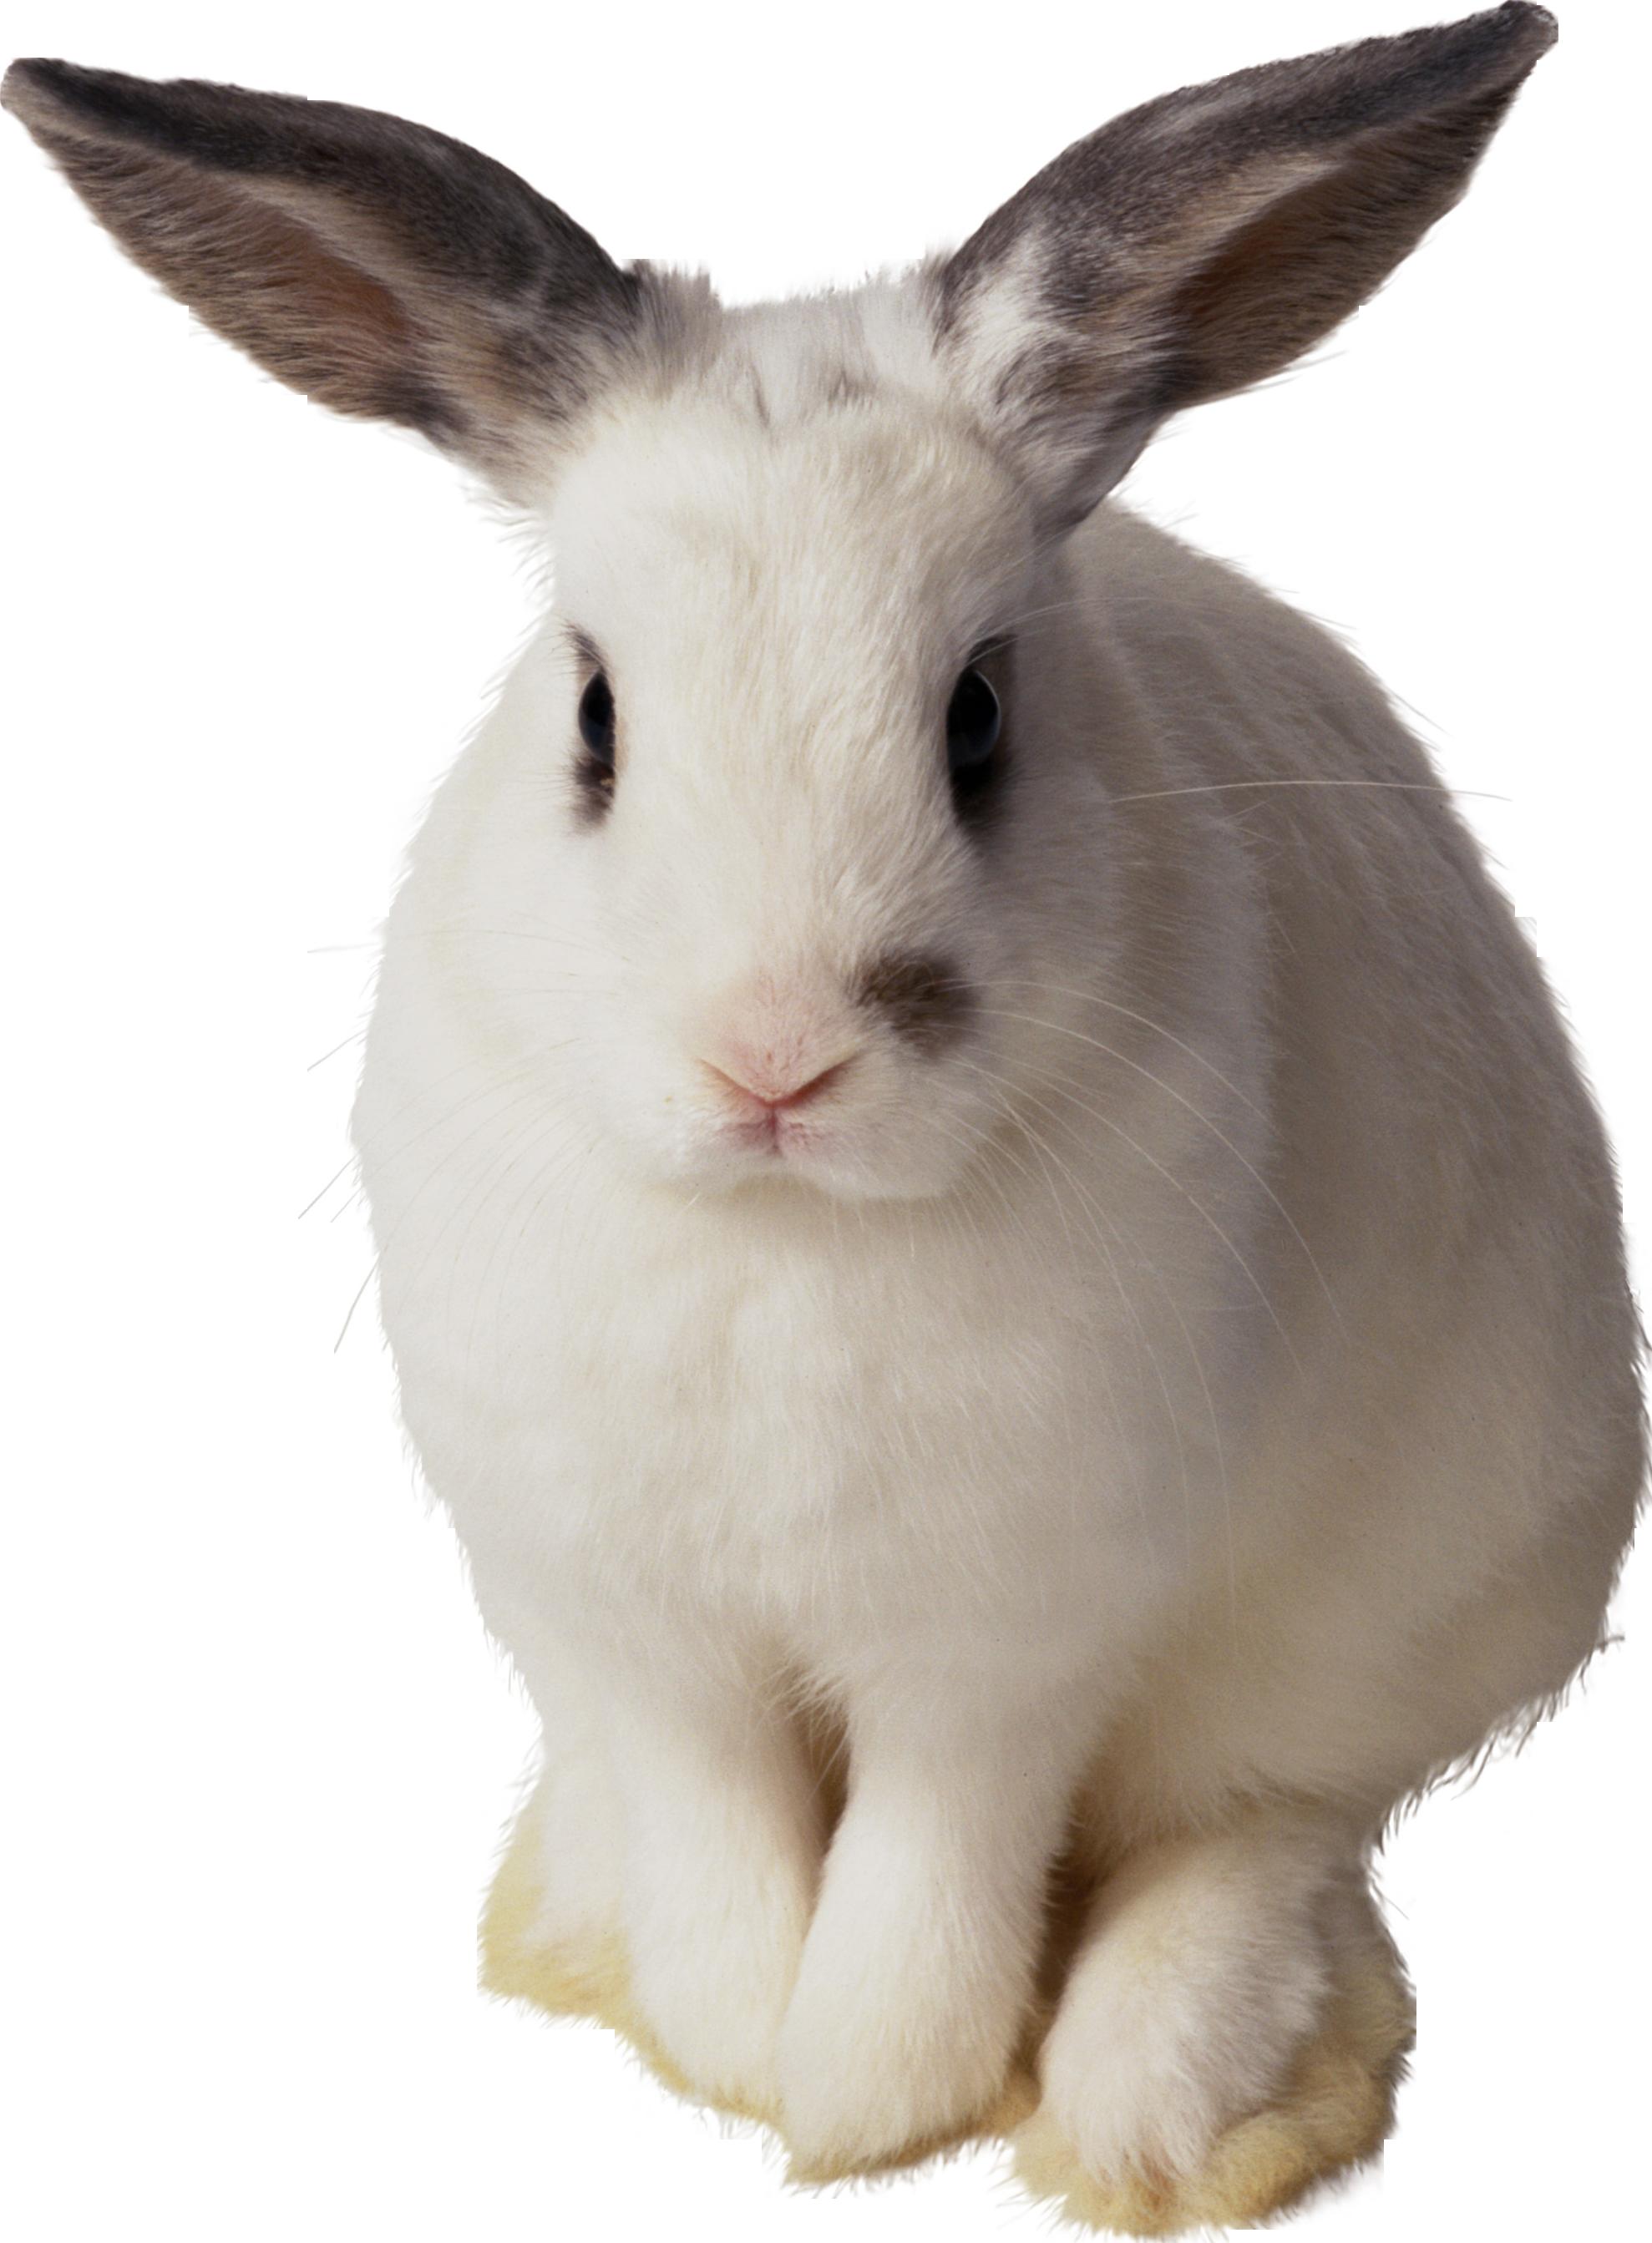 White rabbit PNG image